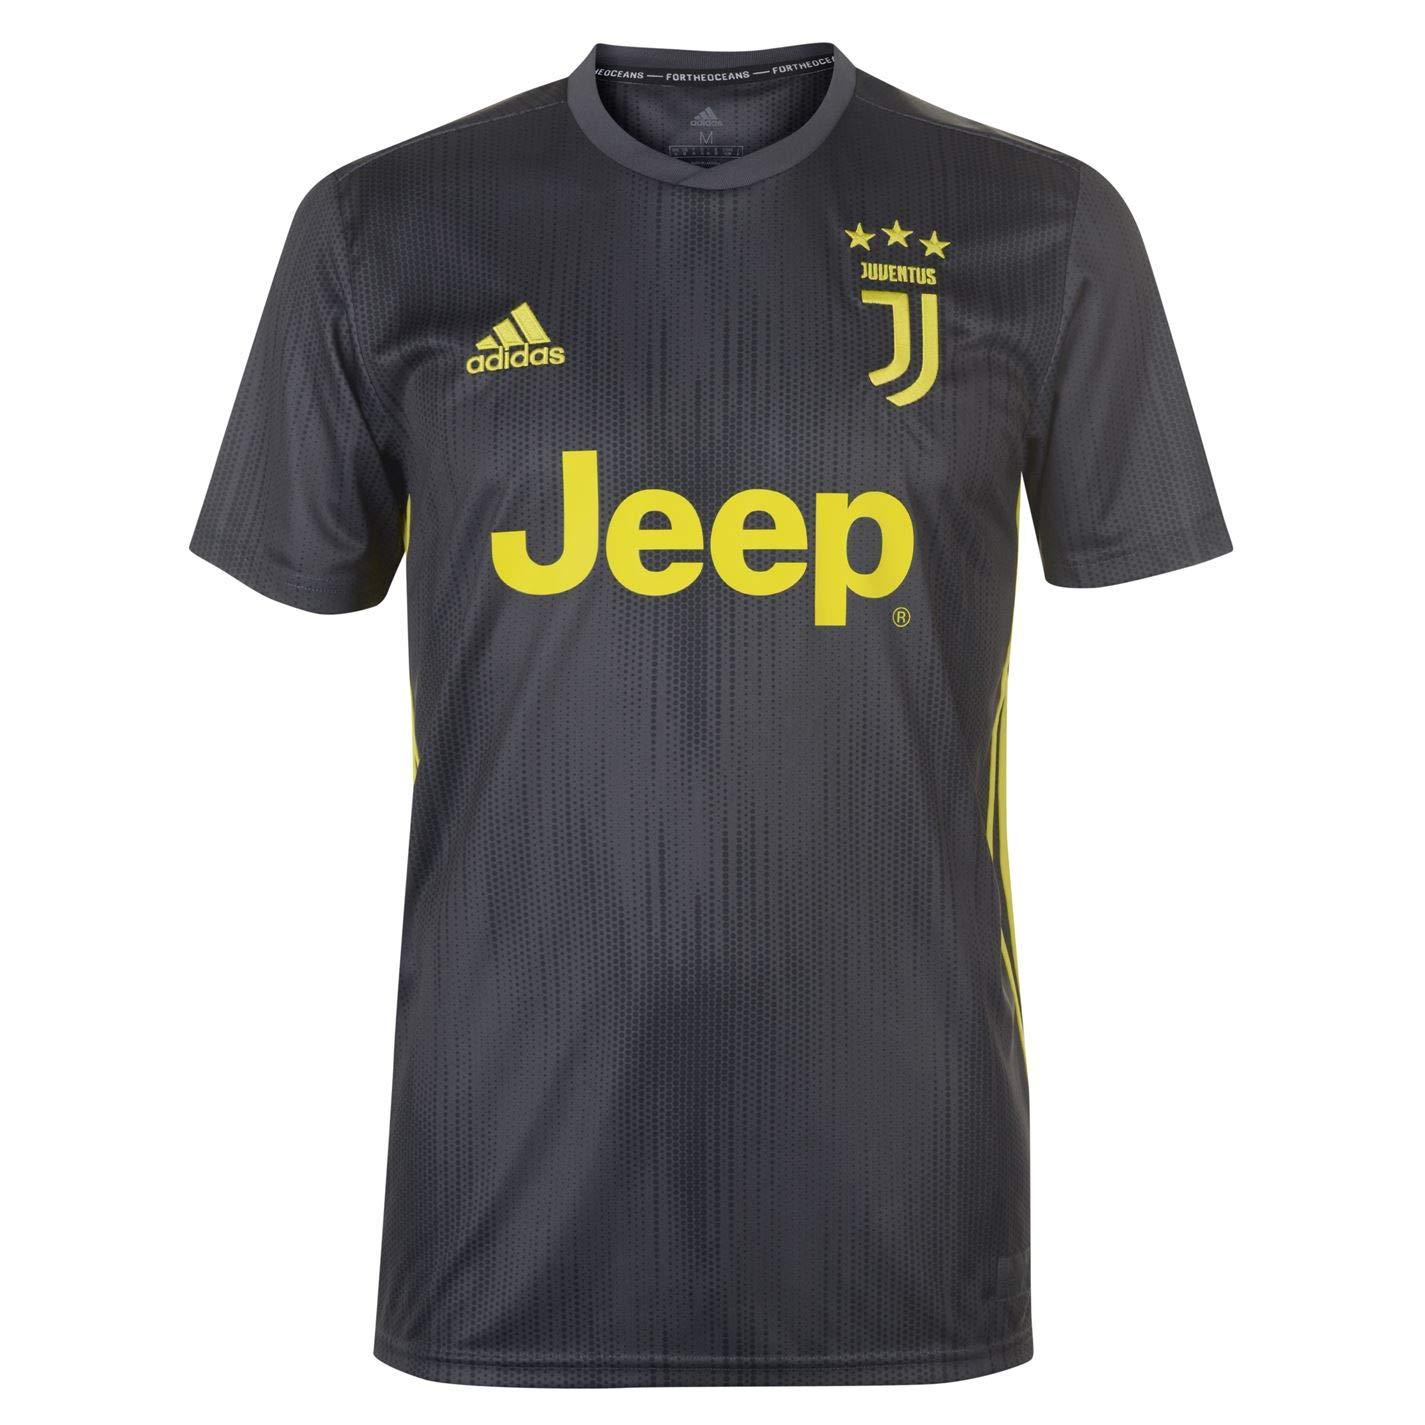 098e45aba Amazon.com   adidas 2018-2019 Juventus Third Football Shirt   Sports    Outdoors